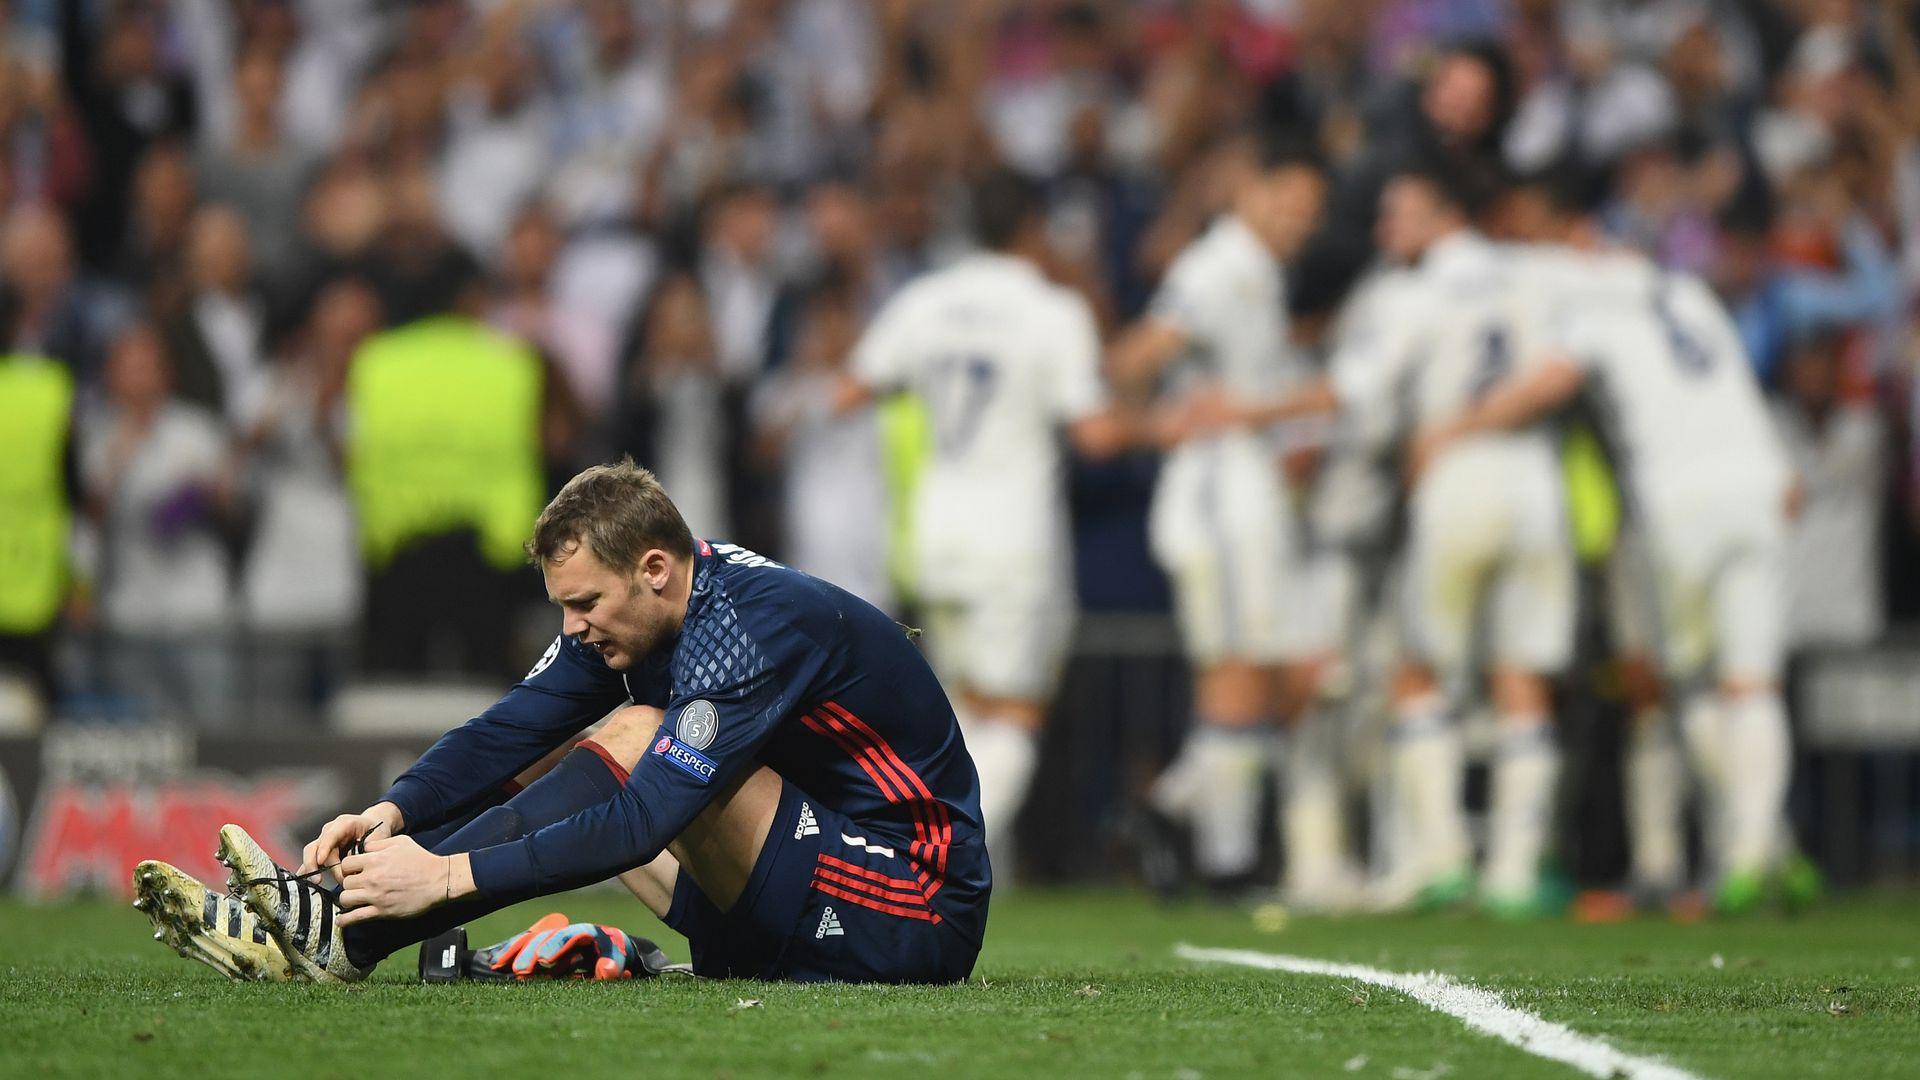 Manuel Neuer Verletzung Fuß